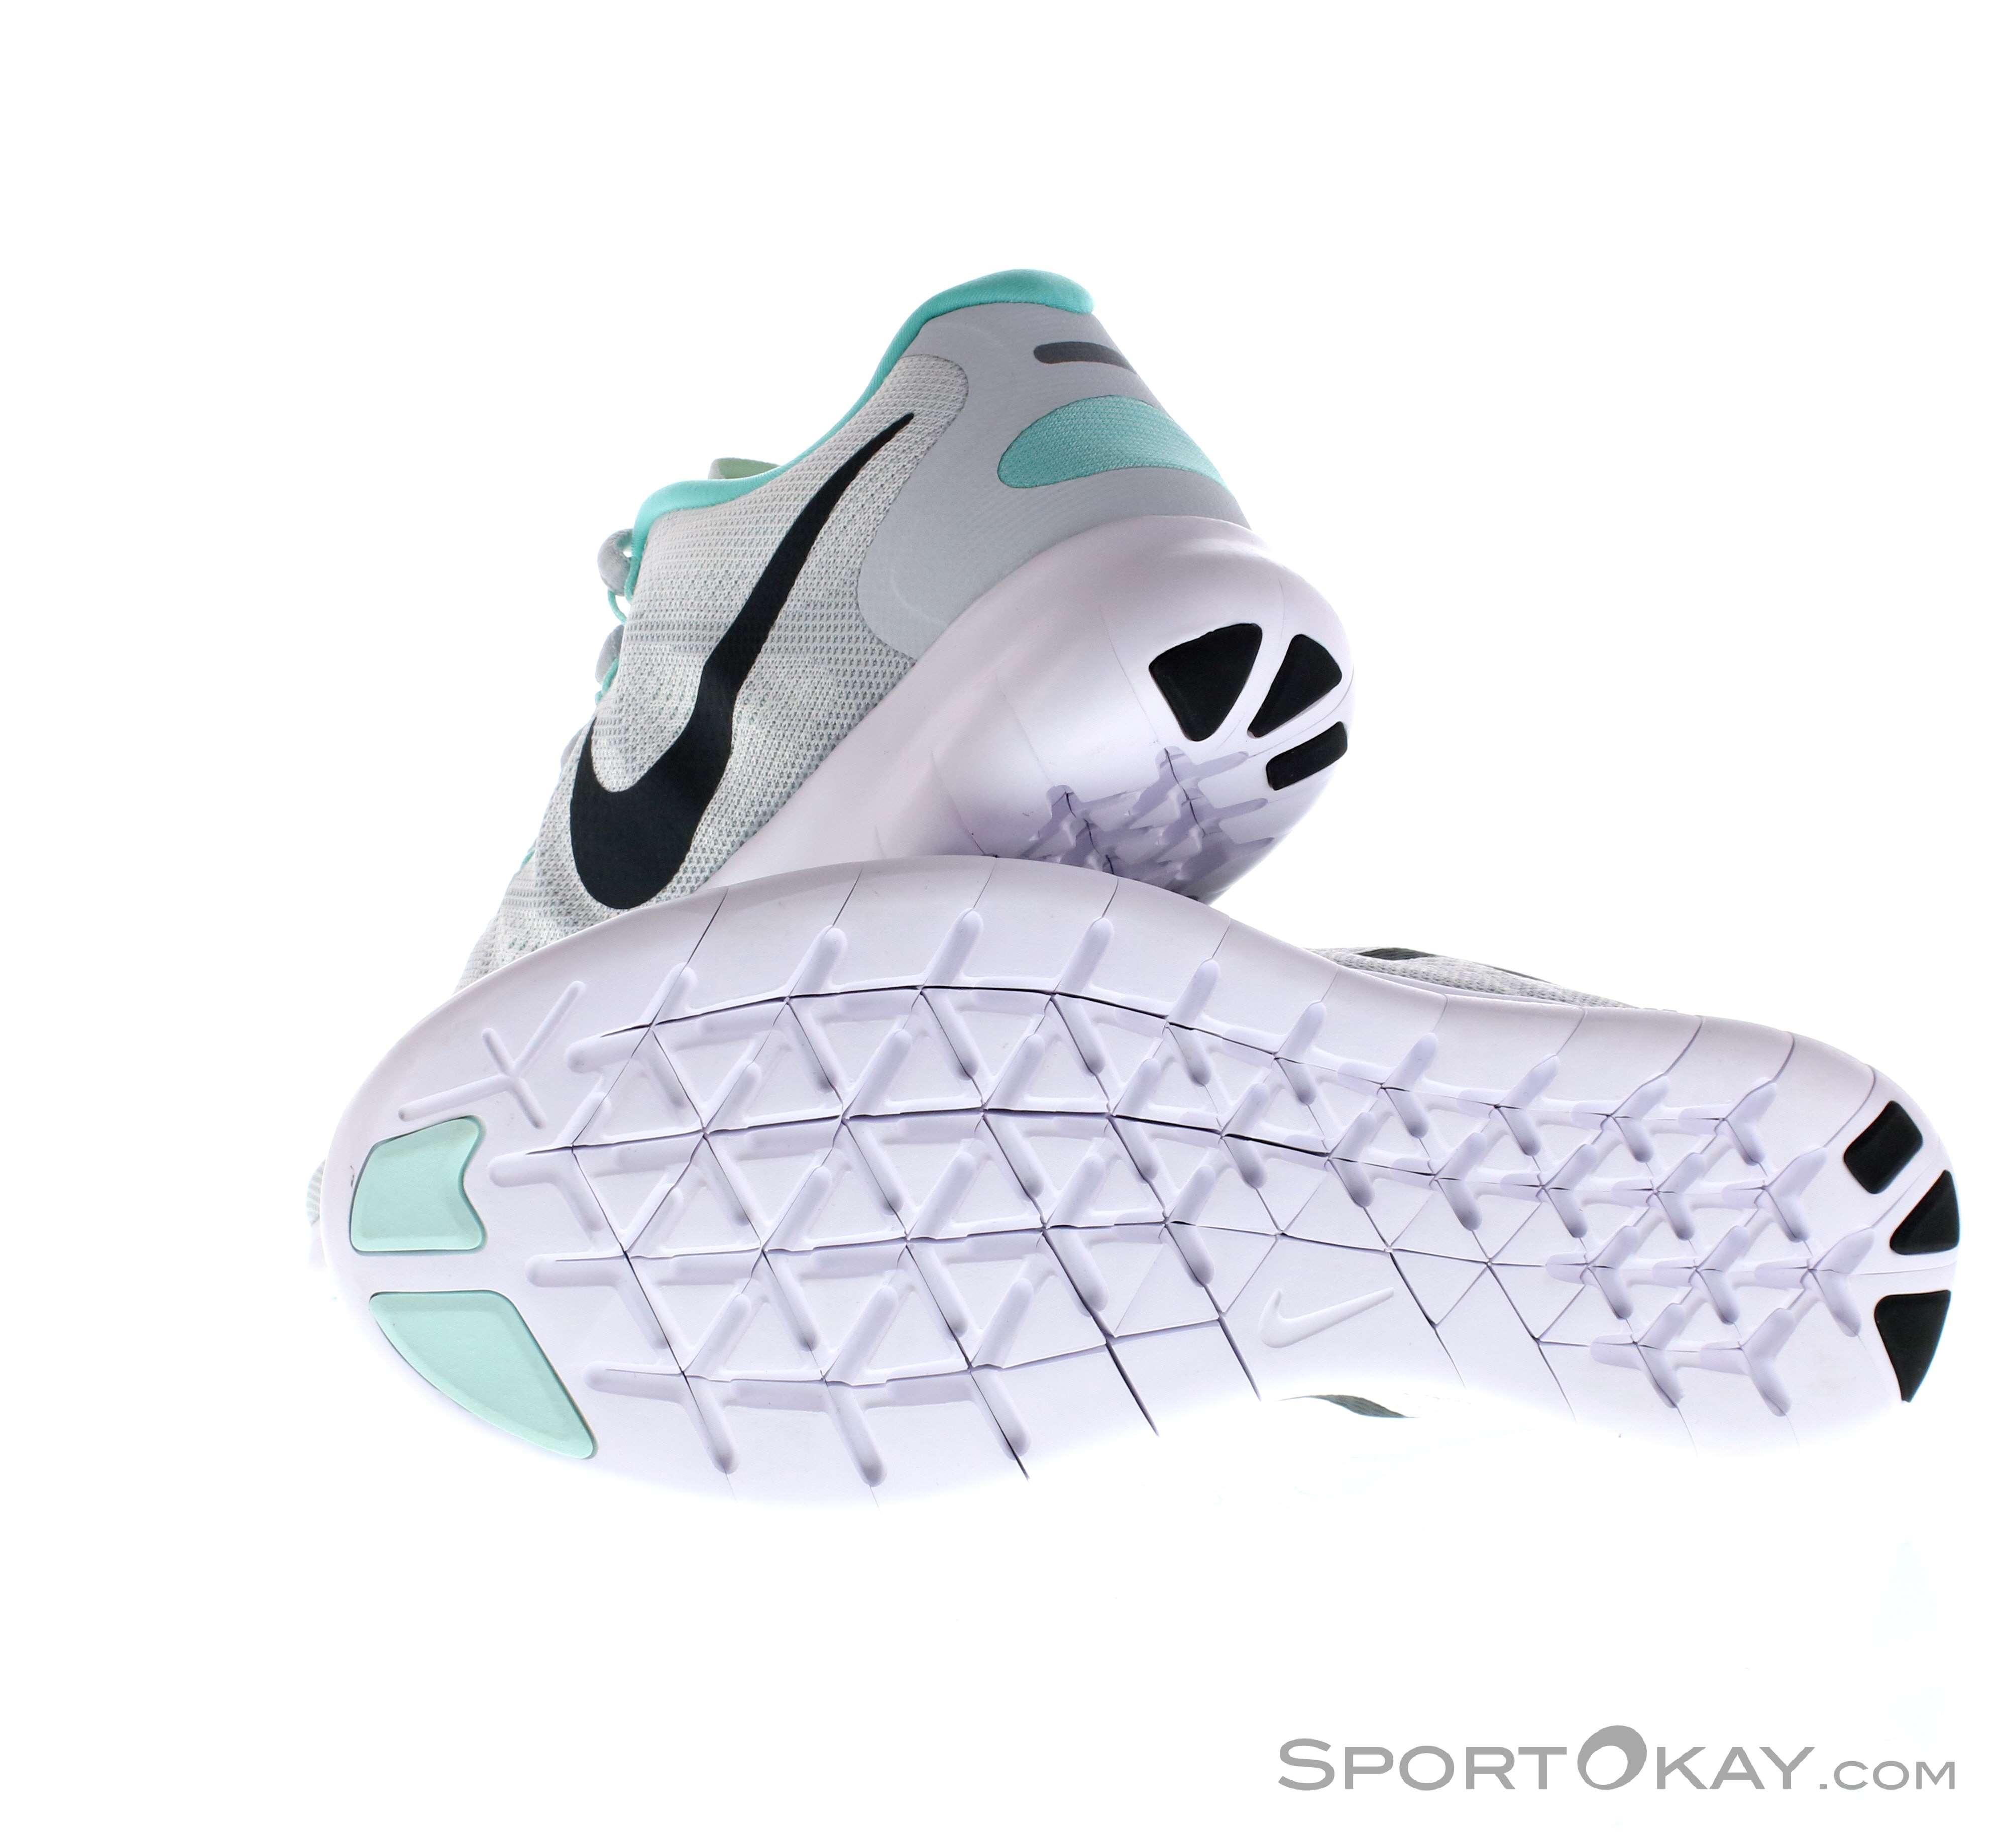 new products 92c6f 6e8c8 Nike Free Run 2 Womens Running Shoes , Nike, White, , Female, 0026